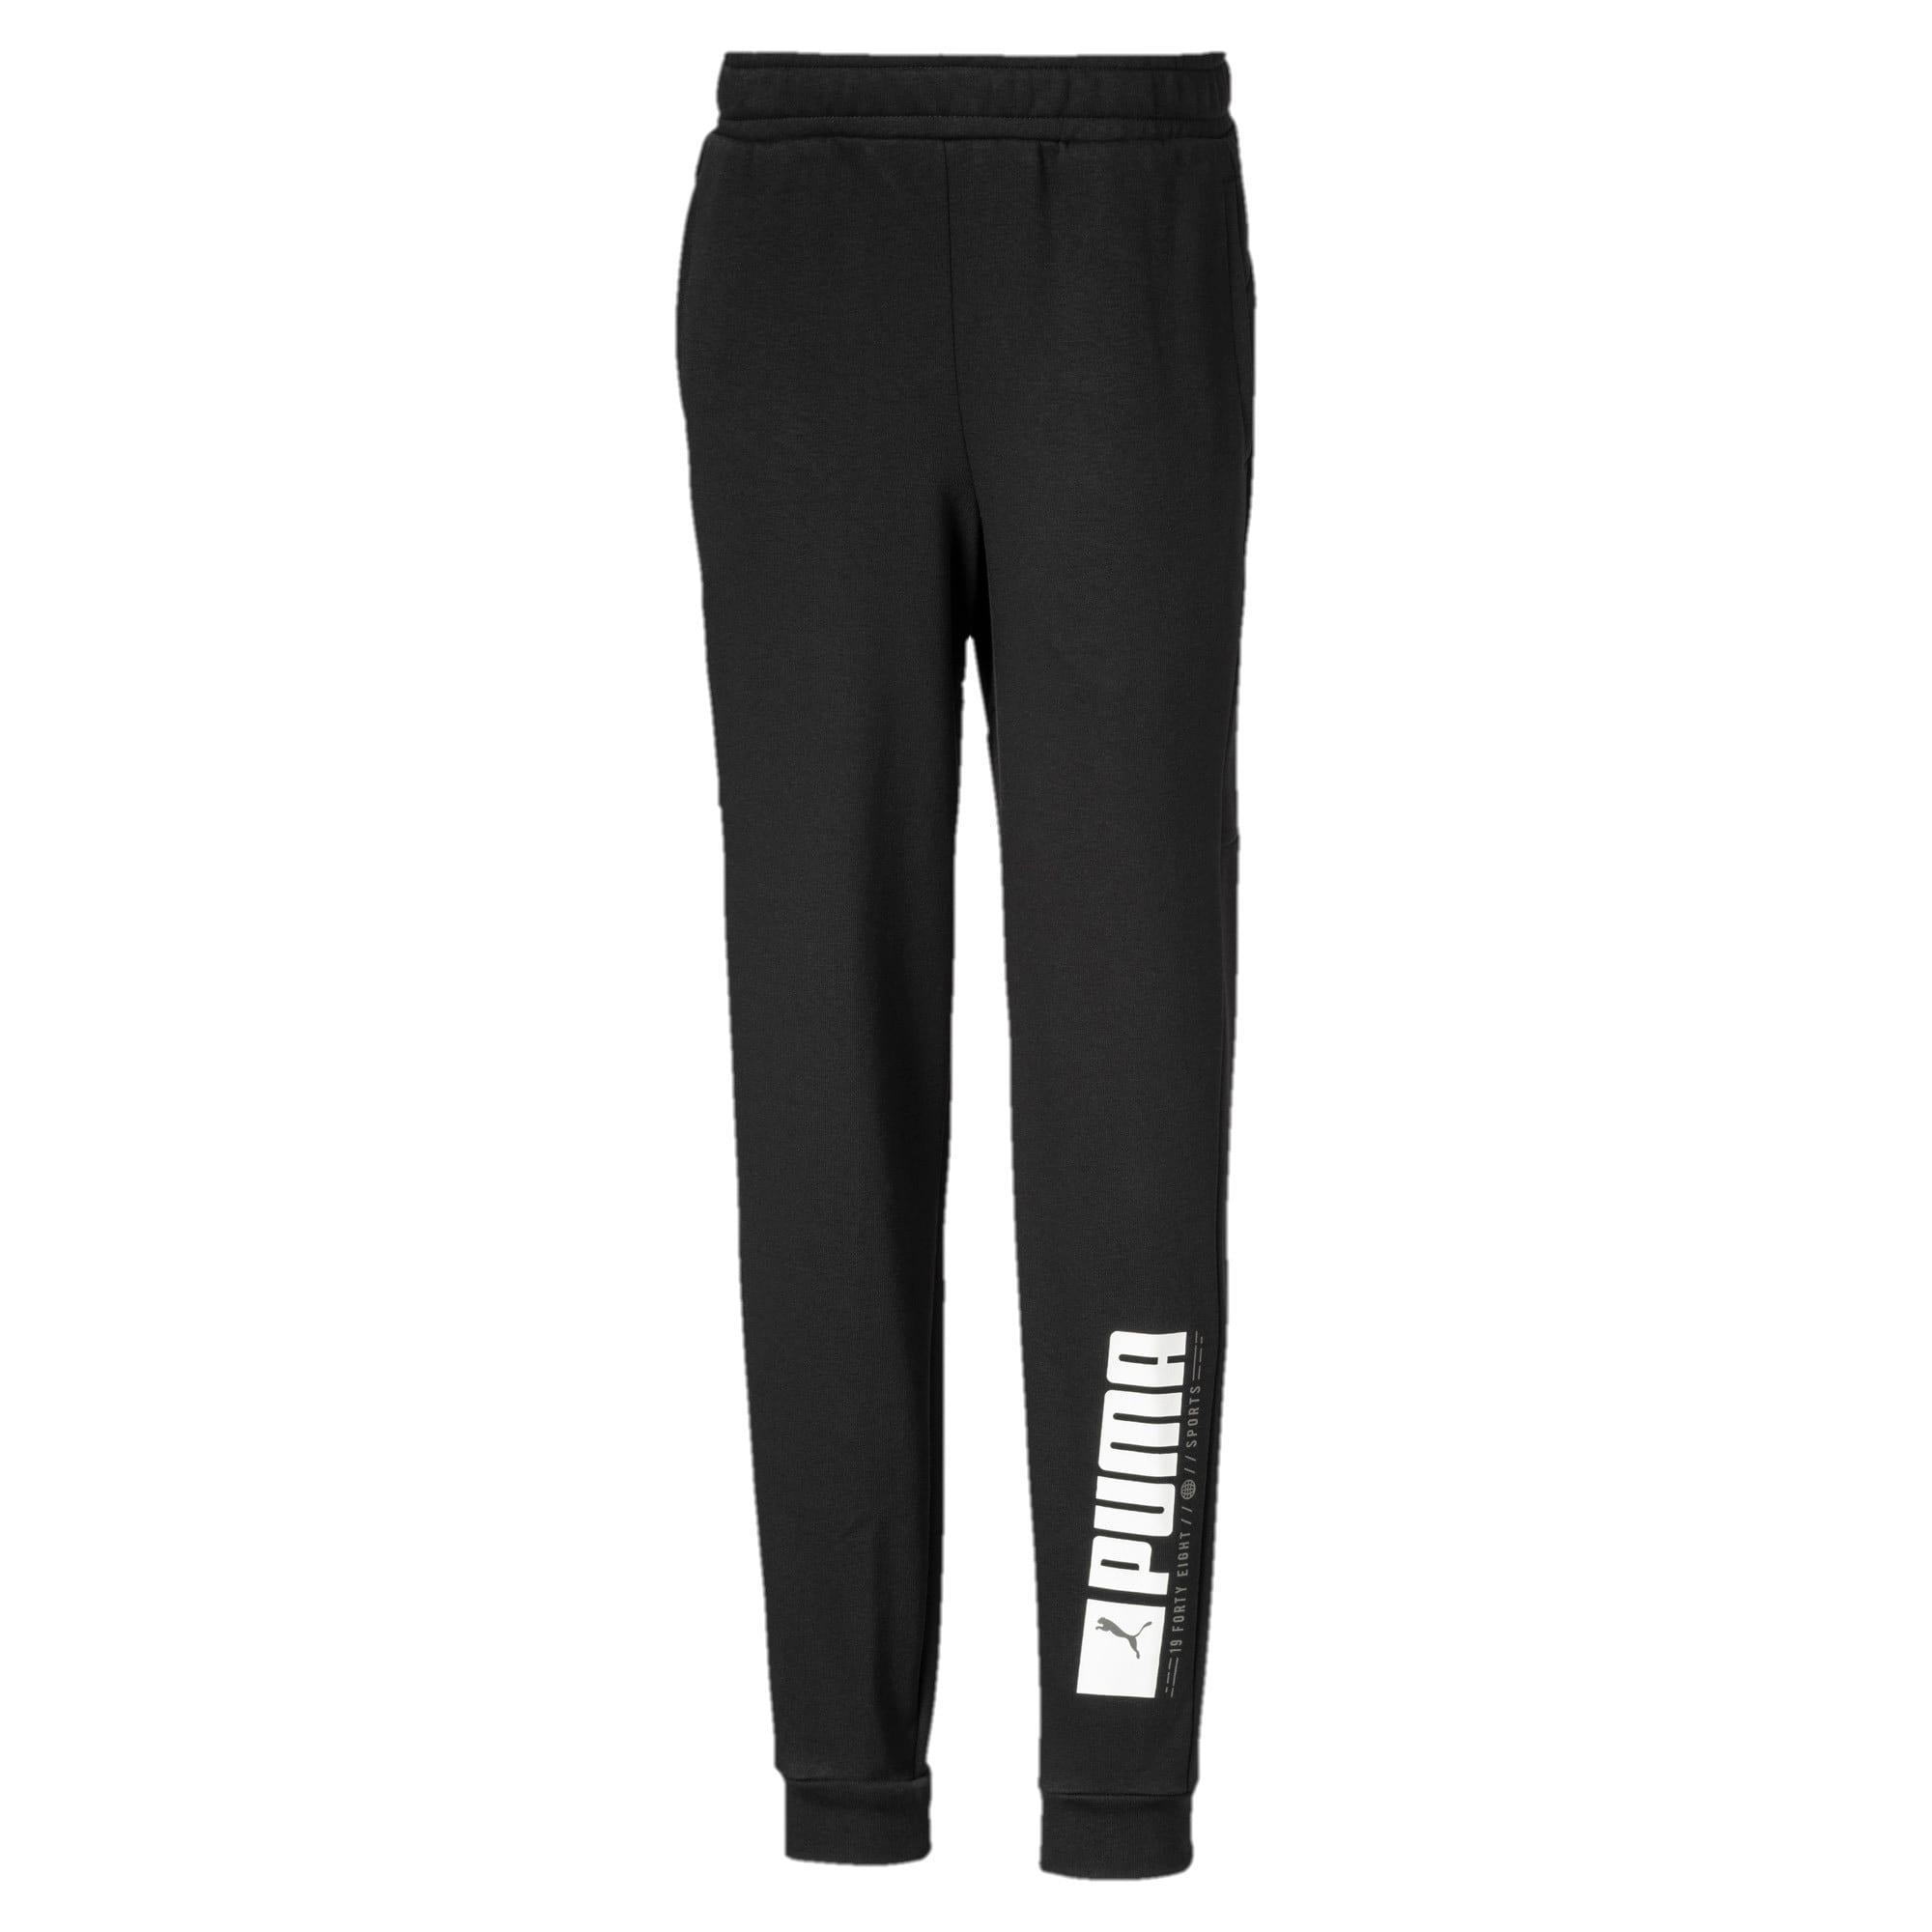 Thumbnail 1 of Active Sports Boys' Sweatpants, Puma Black, medium-IND